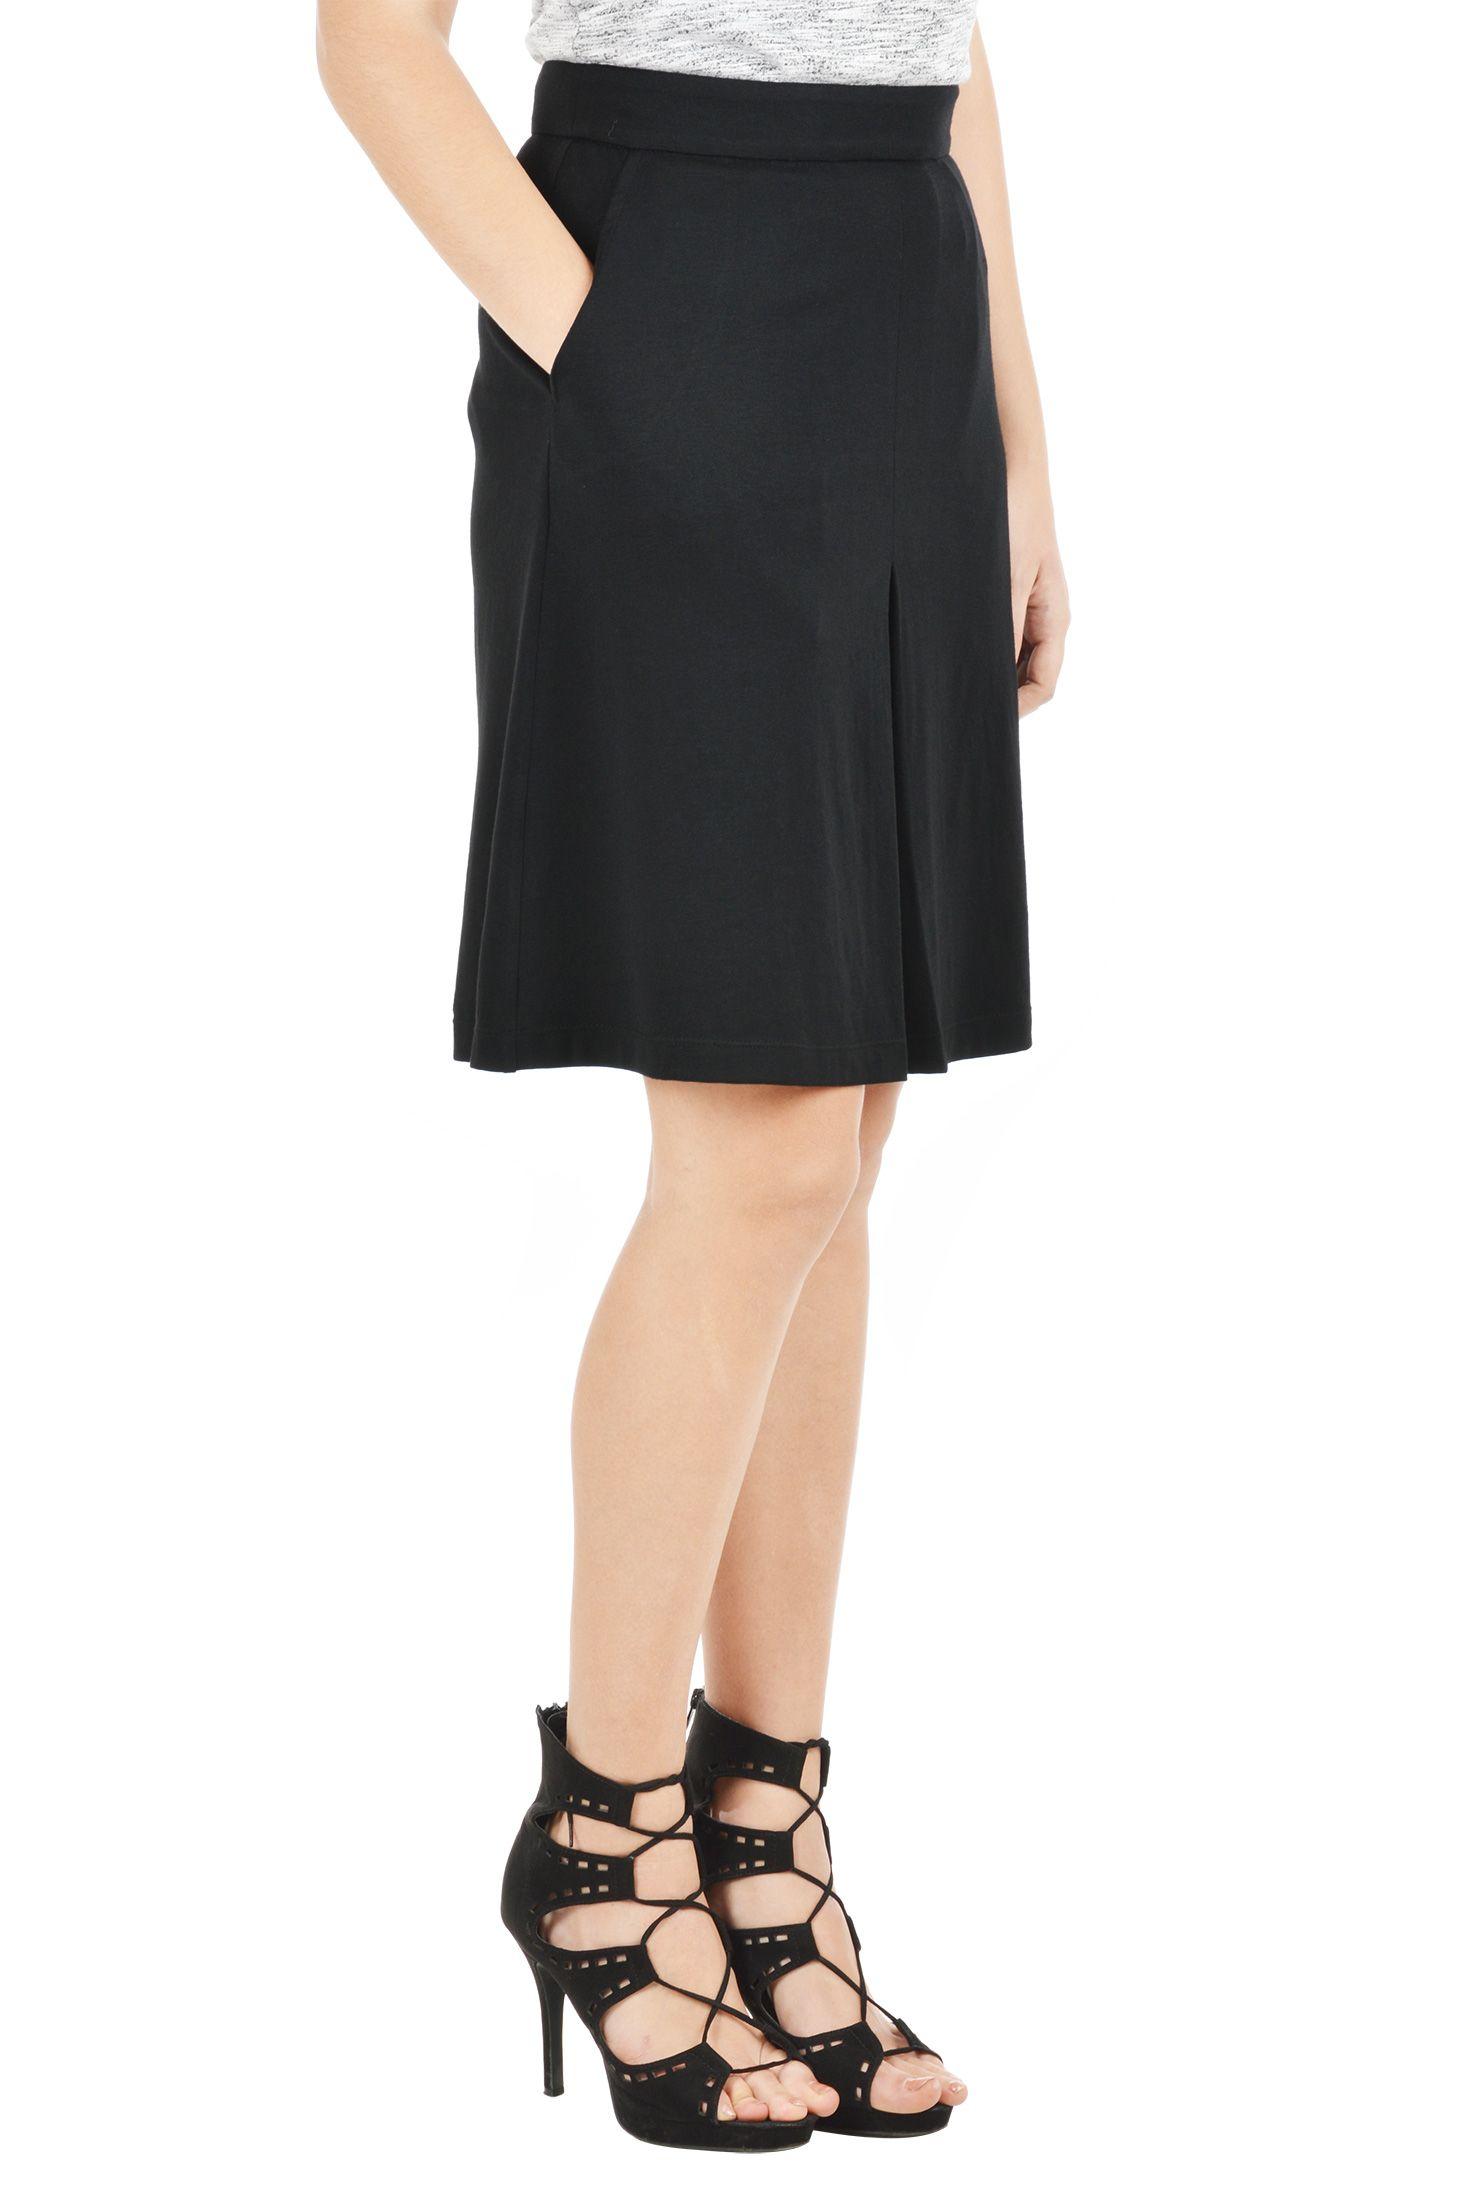 c4886436ea Above knee length skirts, banded waist skirts, Black Skirts, Cotton/spandex